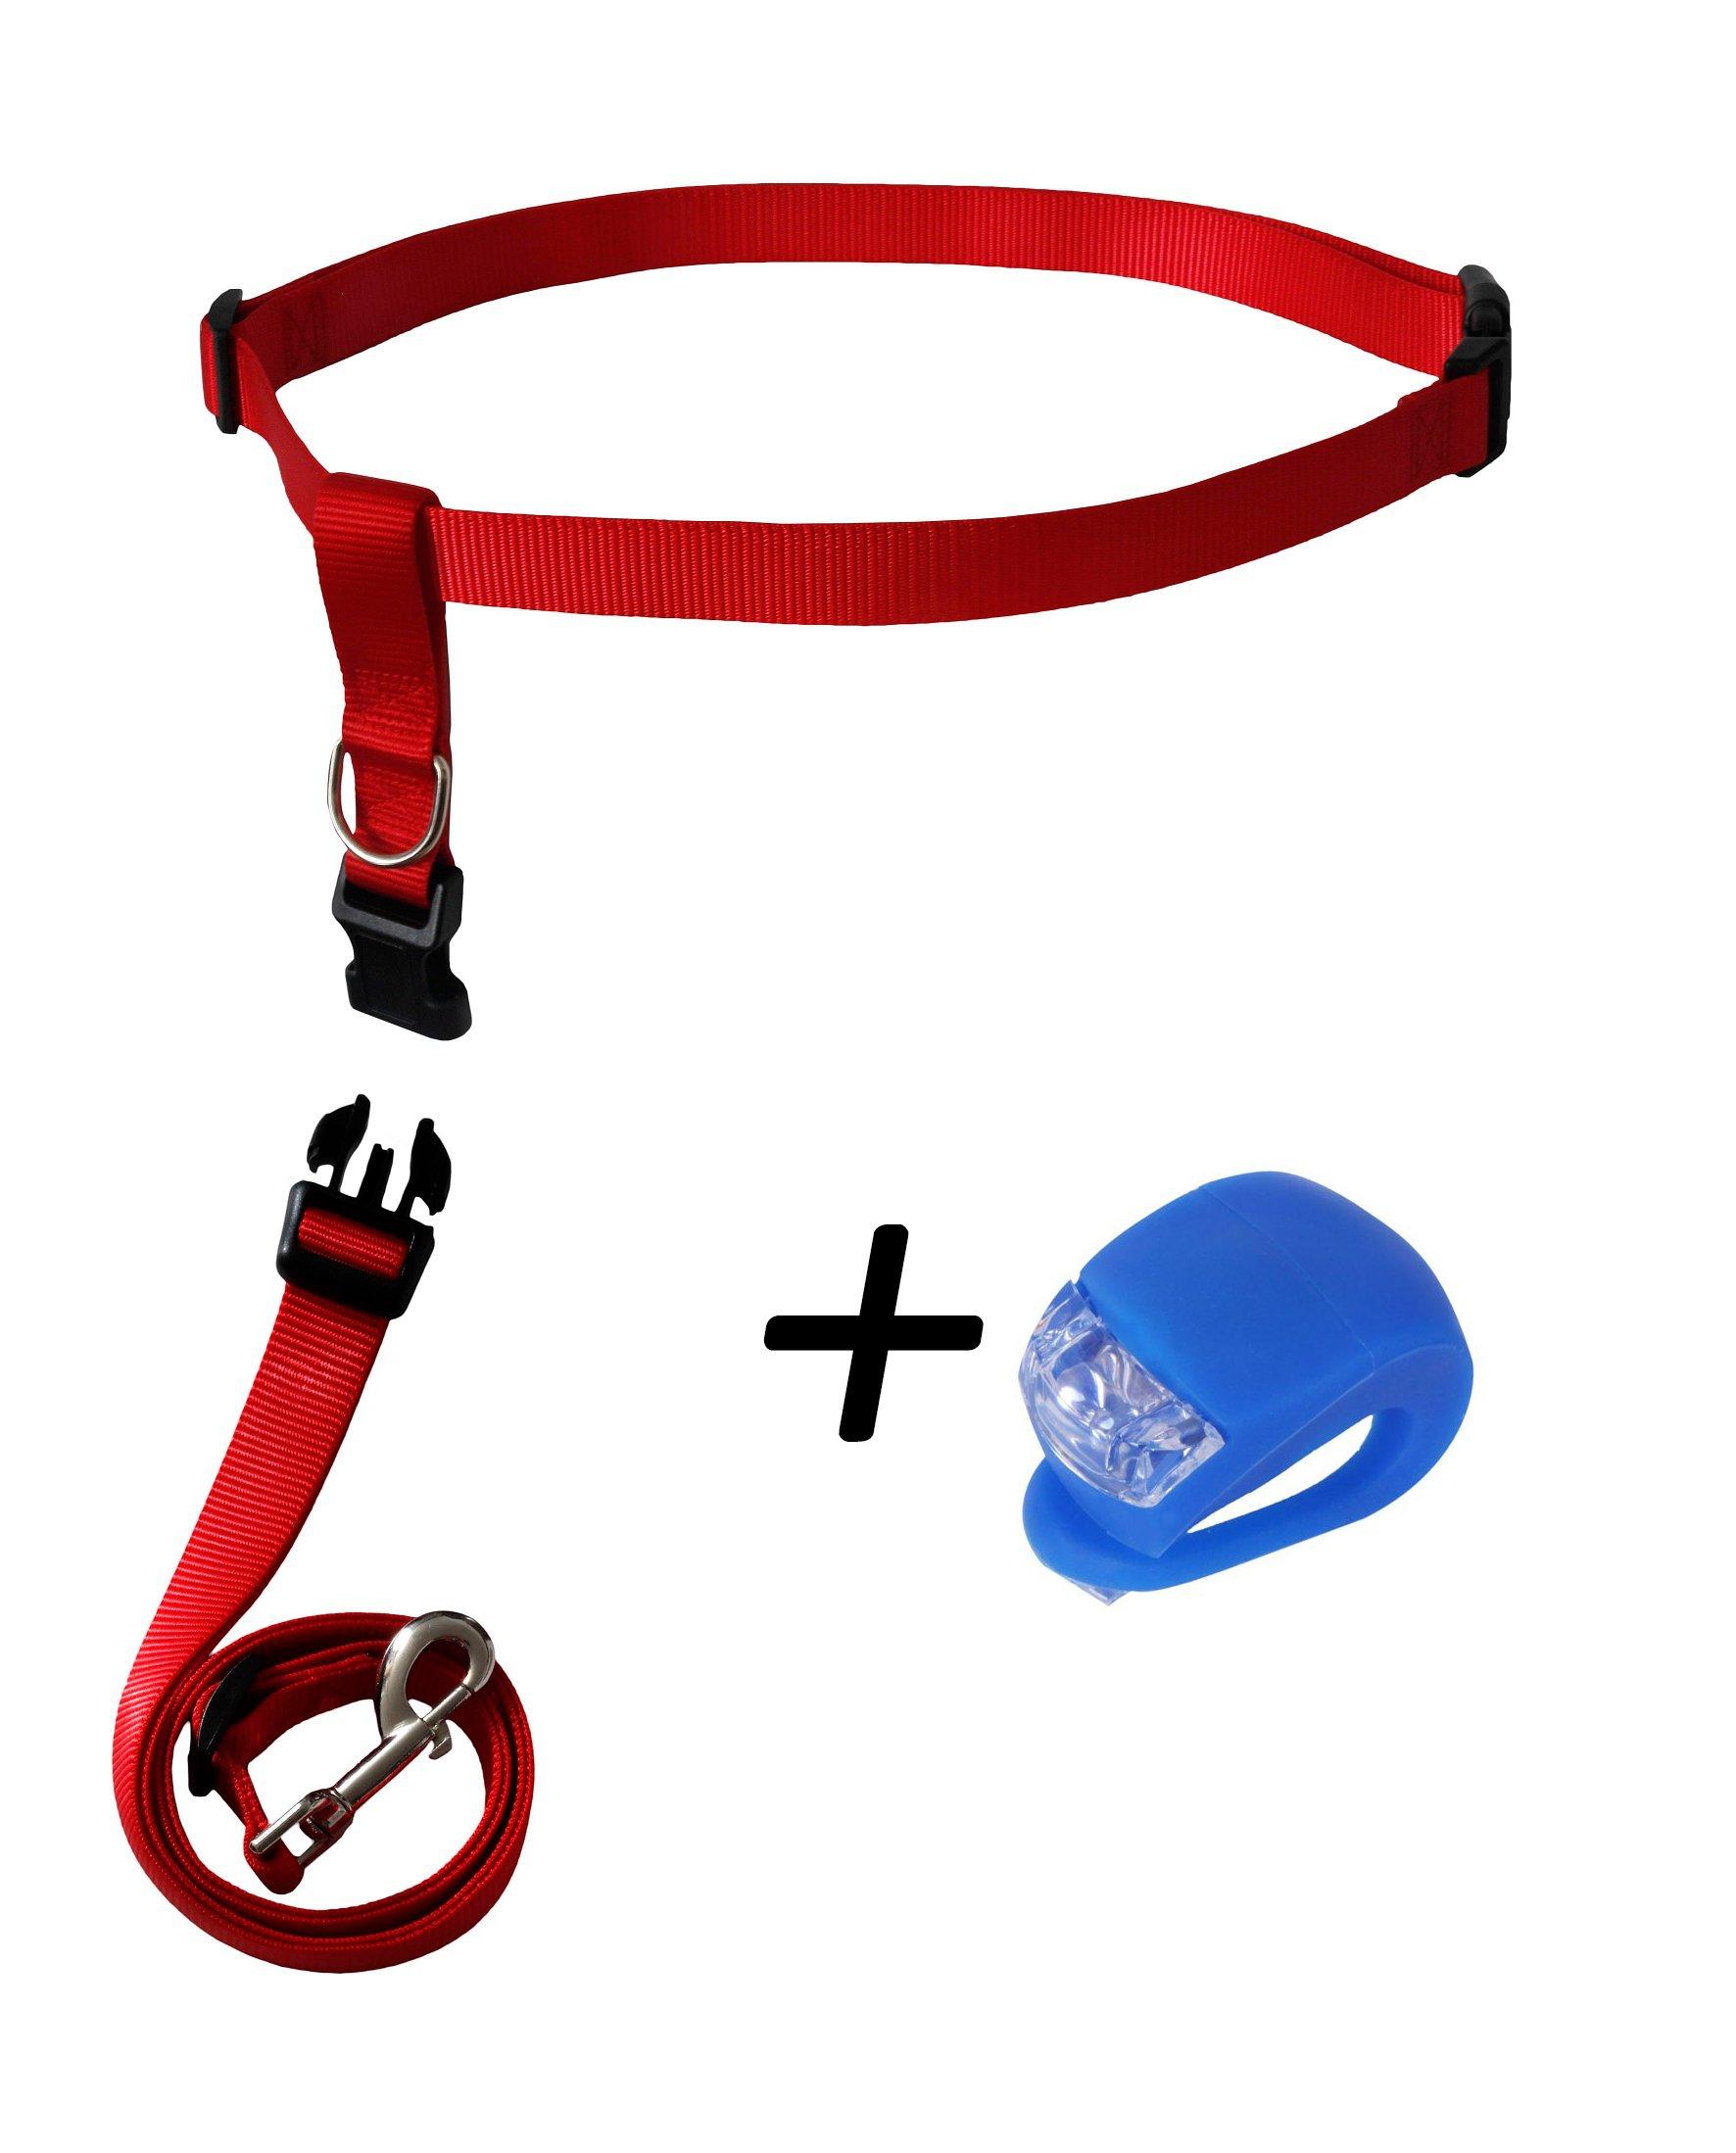 RoadRunner Running Dog Leash Hands Free Including LED Light. Great for Walking, Running, Biking and Jogging (Red). by RoadRunner